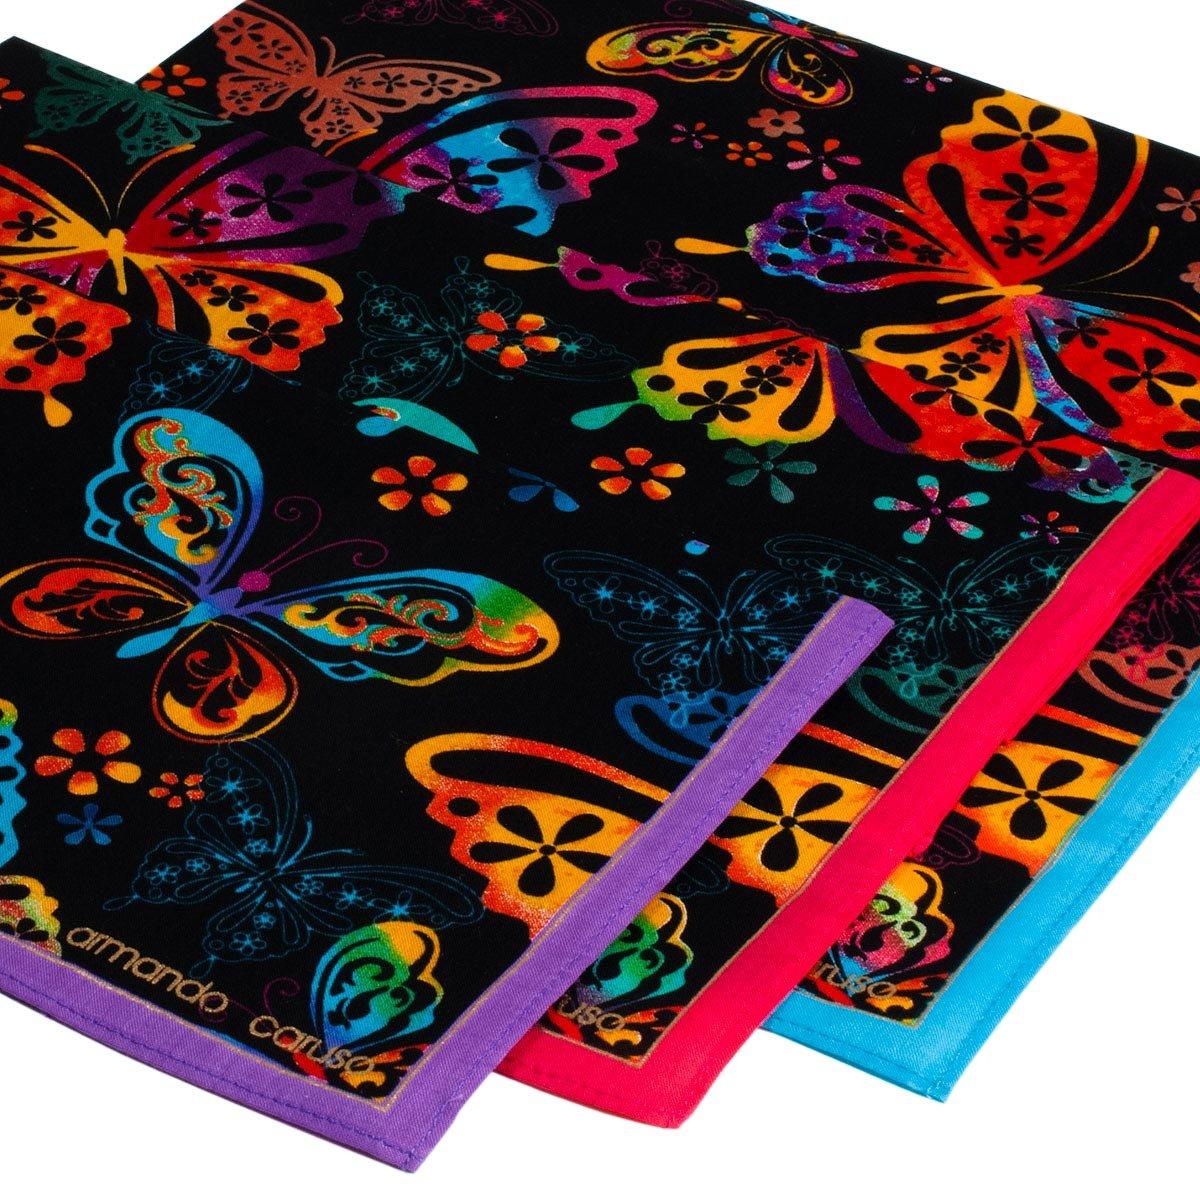 """Butterfly"" handkerchiefs - 3 units Armando Caruso"